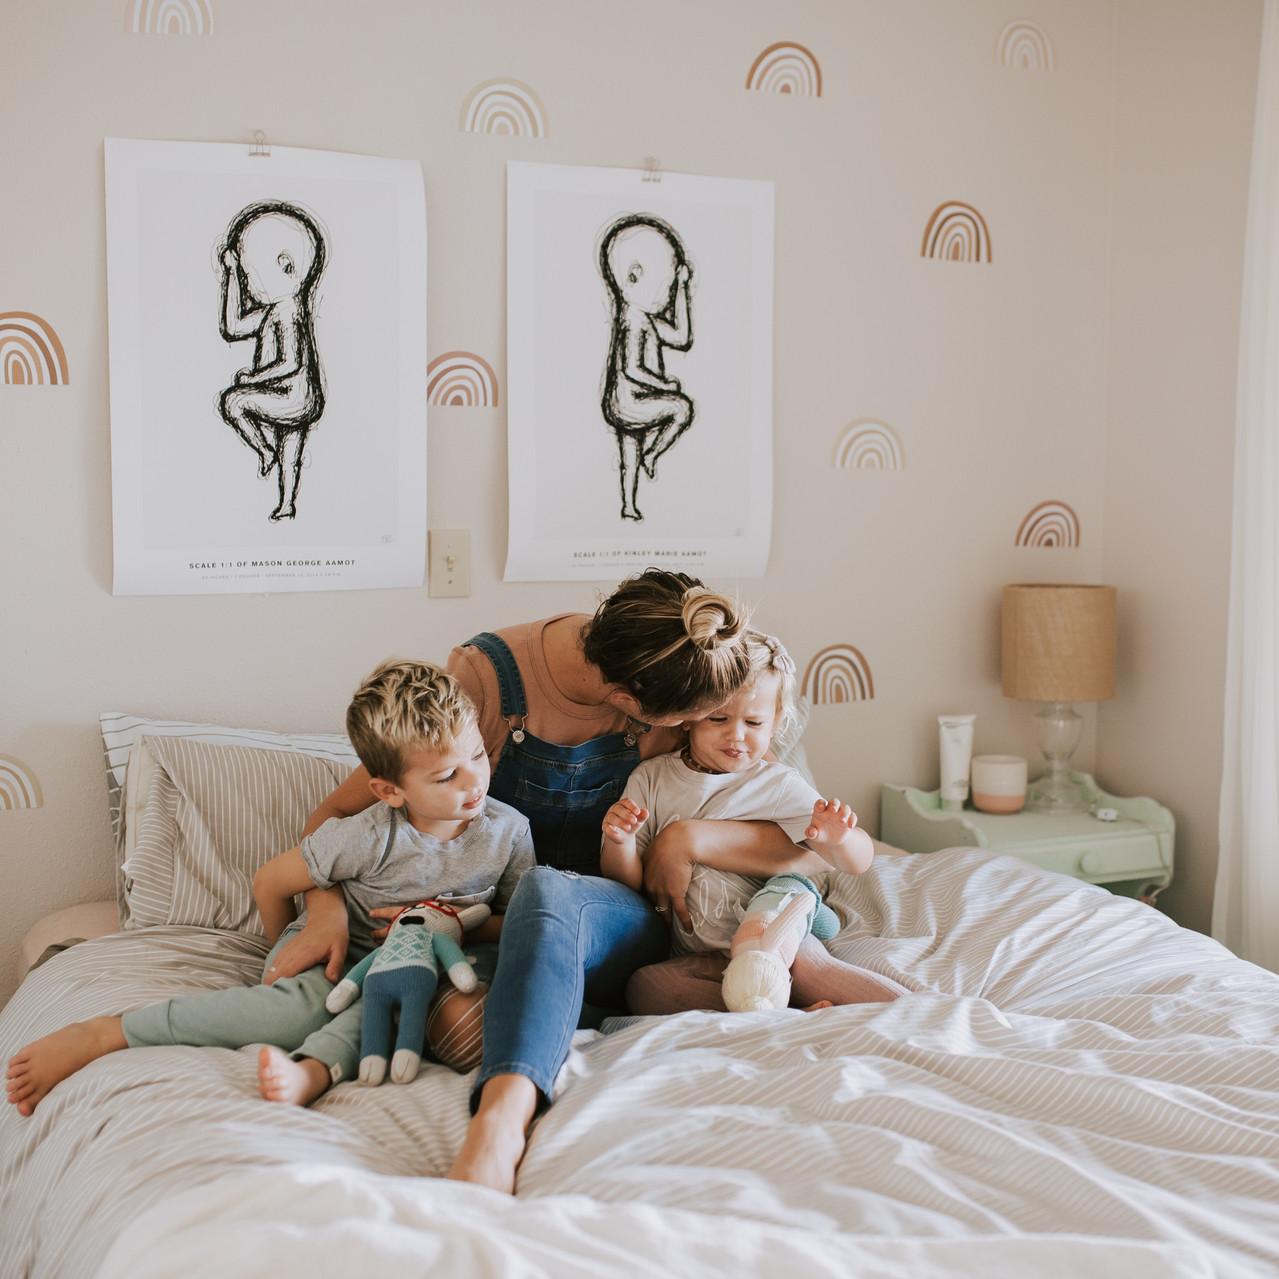 urban-walls-meraki-motherhood-before-noo